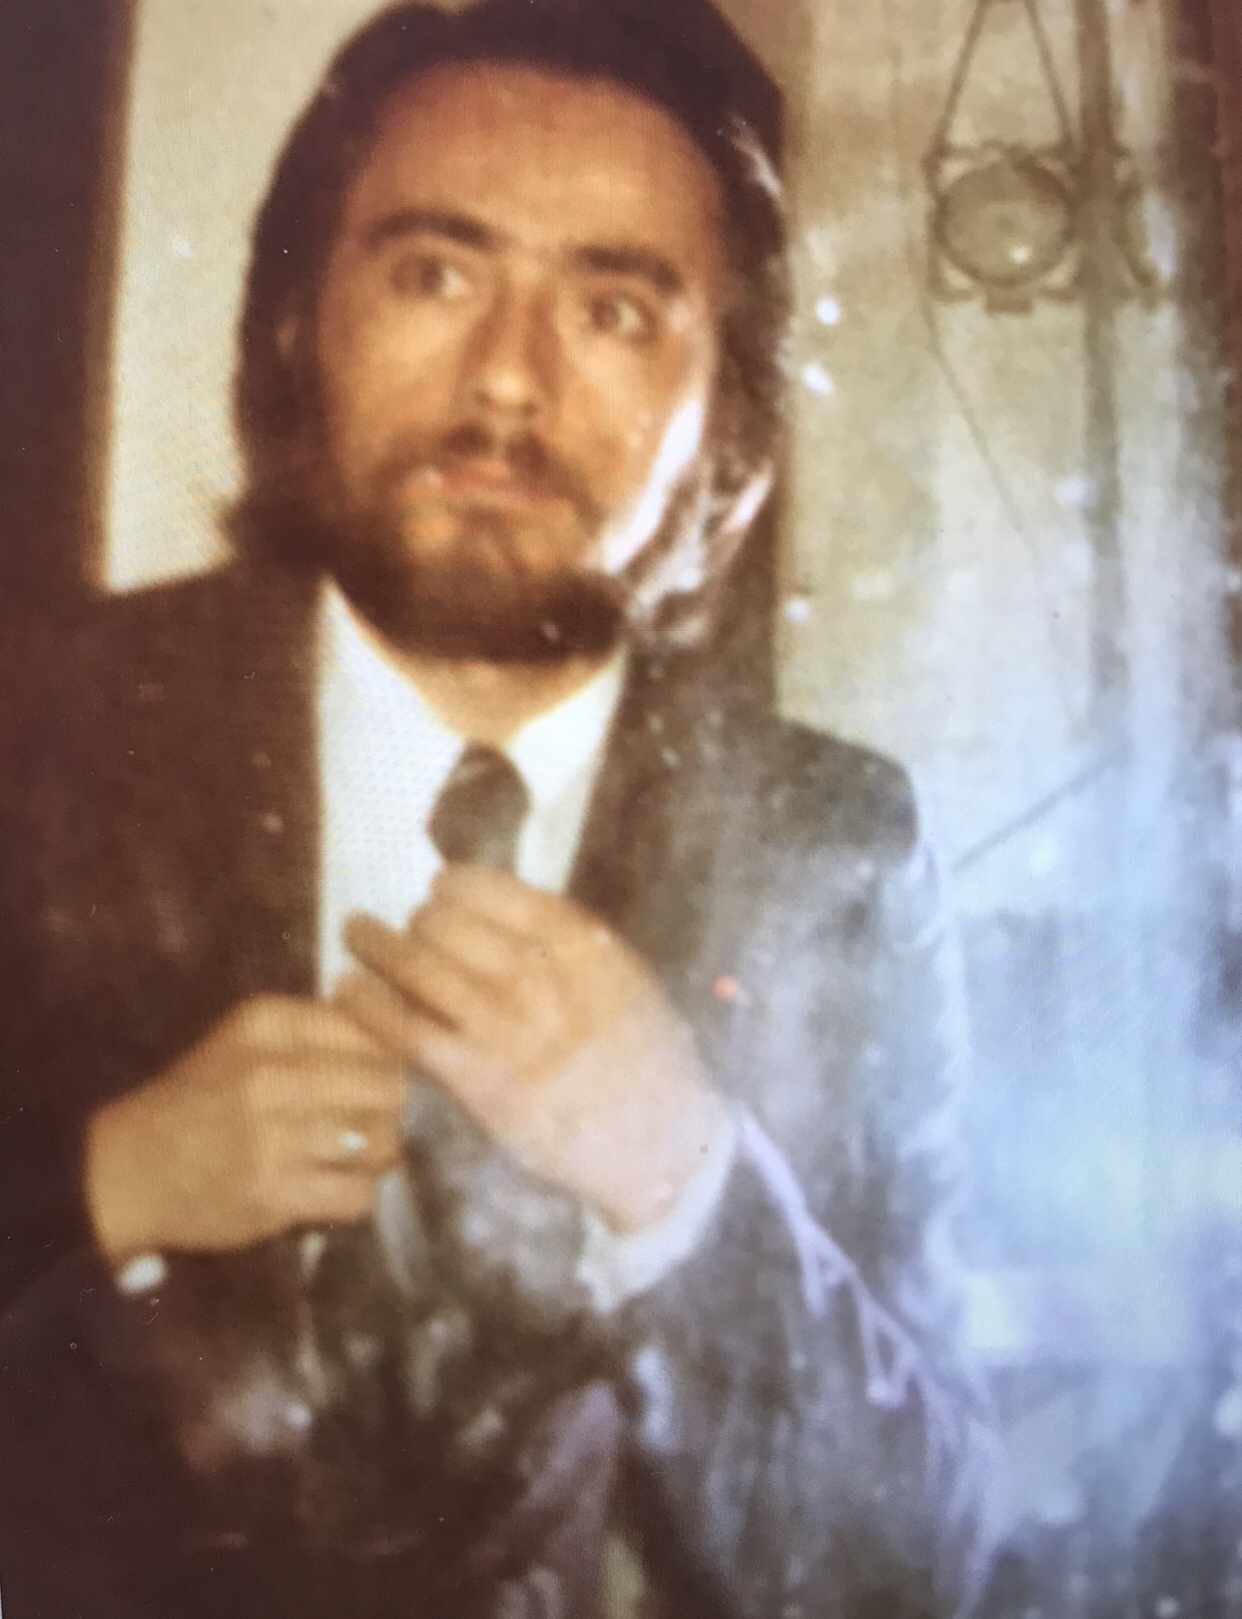 Hugo Sandoval